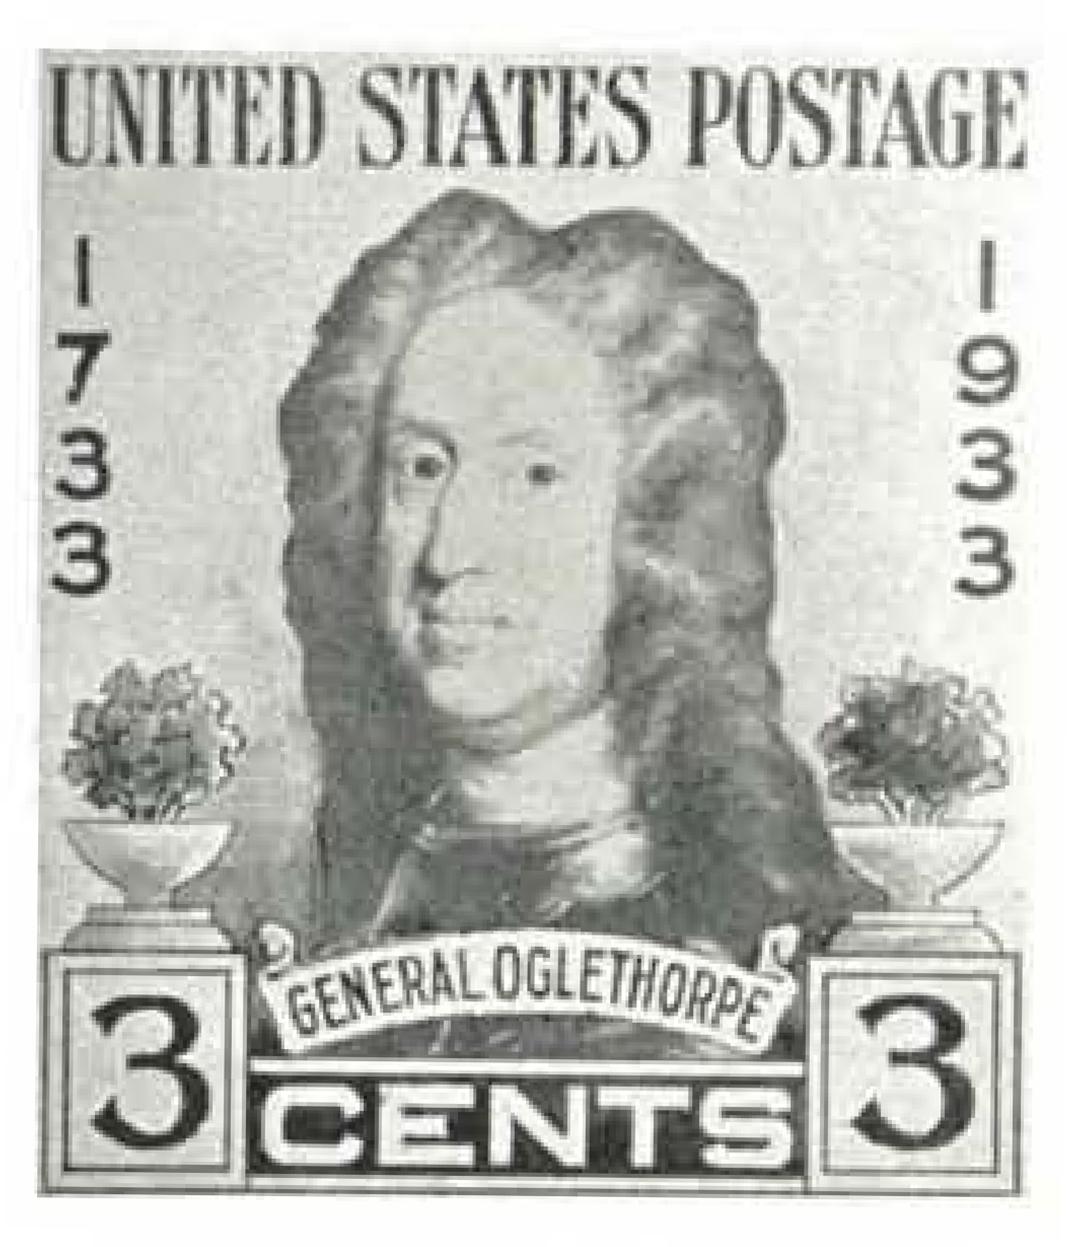 Unused drawing for the General Oglethorpe stamp, designed by A. R. Meissner.